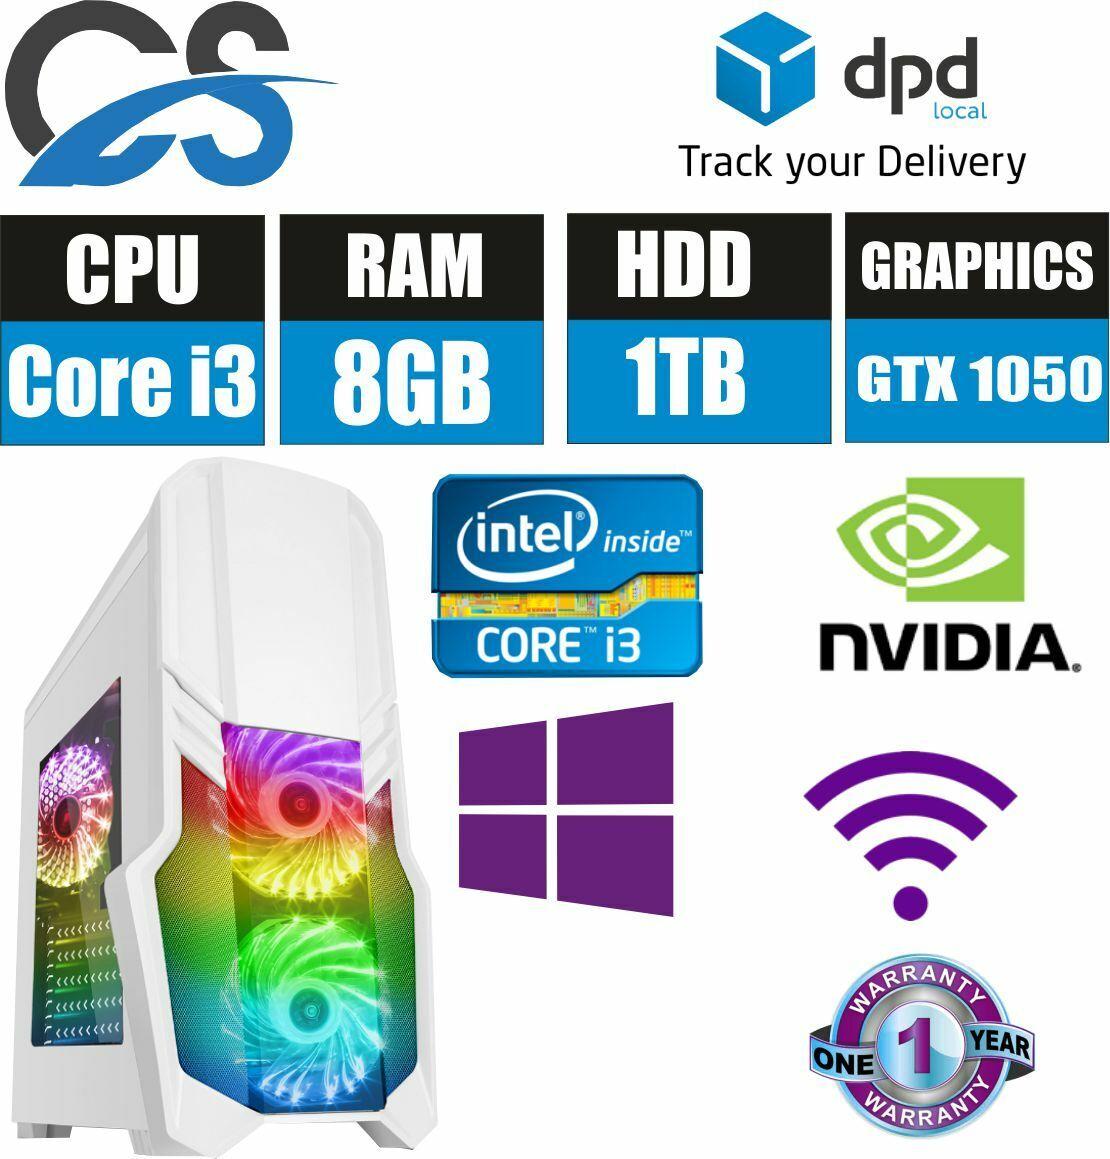 Computer Games - Gaming Computer  Desktop PC Core i3 3.10GHz 8GB RAM 1TB HDD GTX1050 Win10